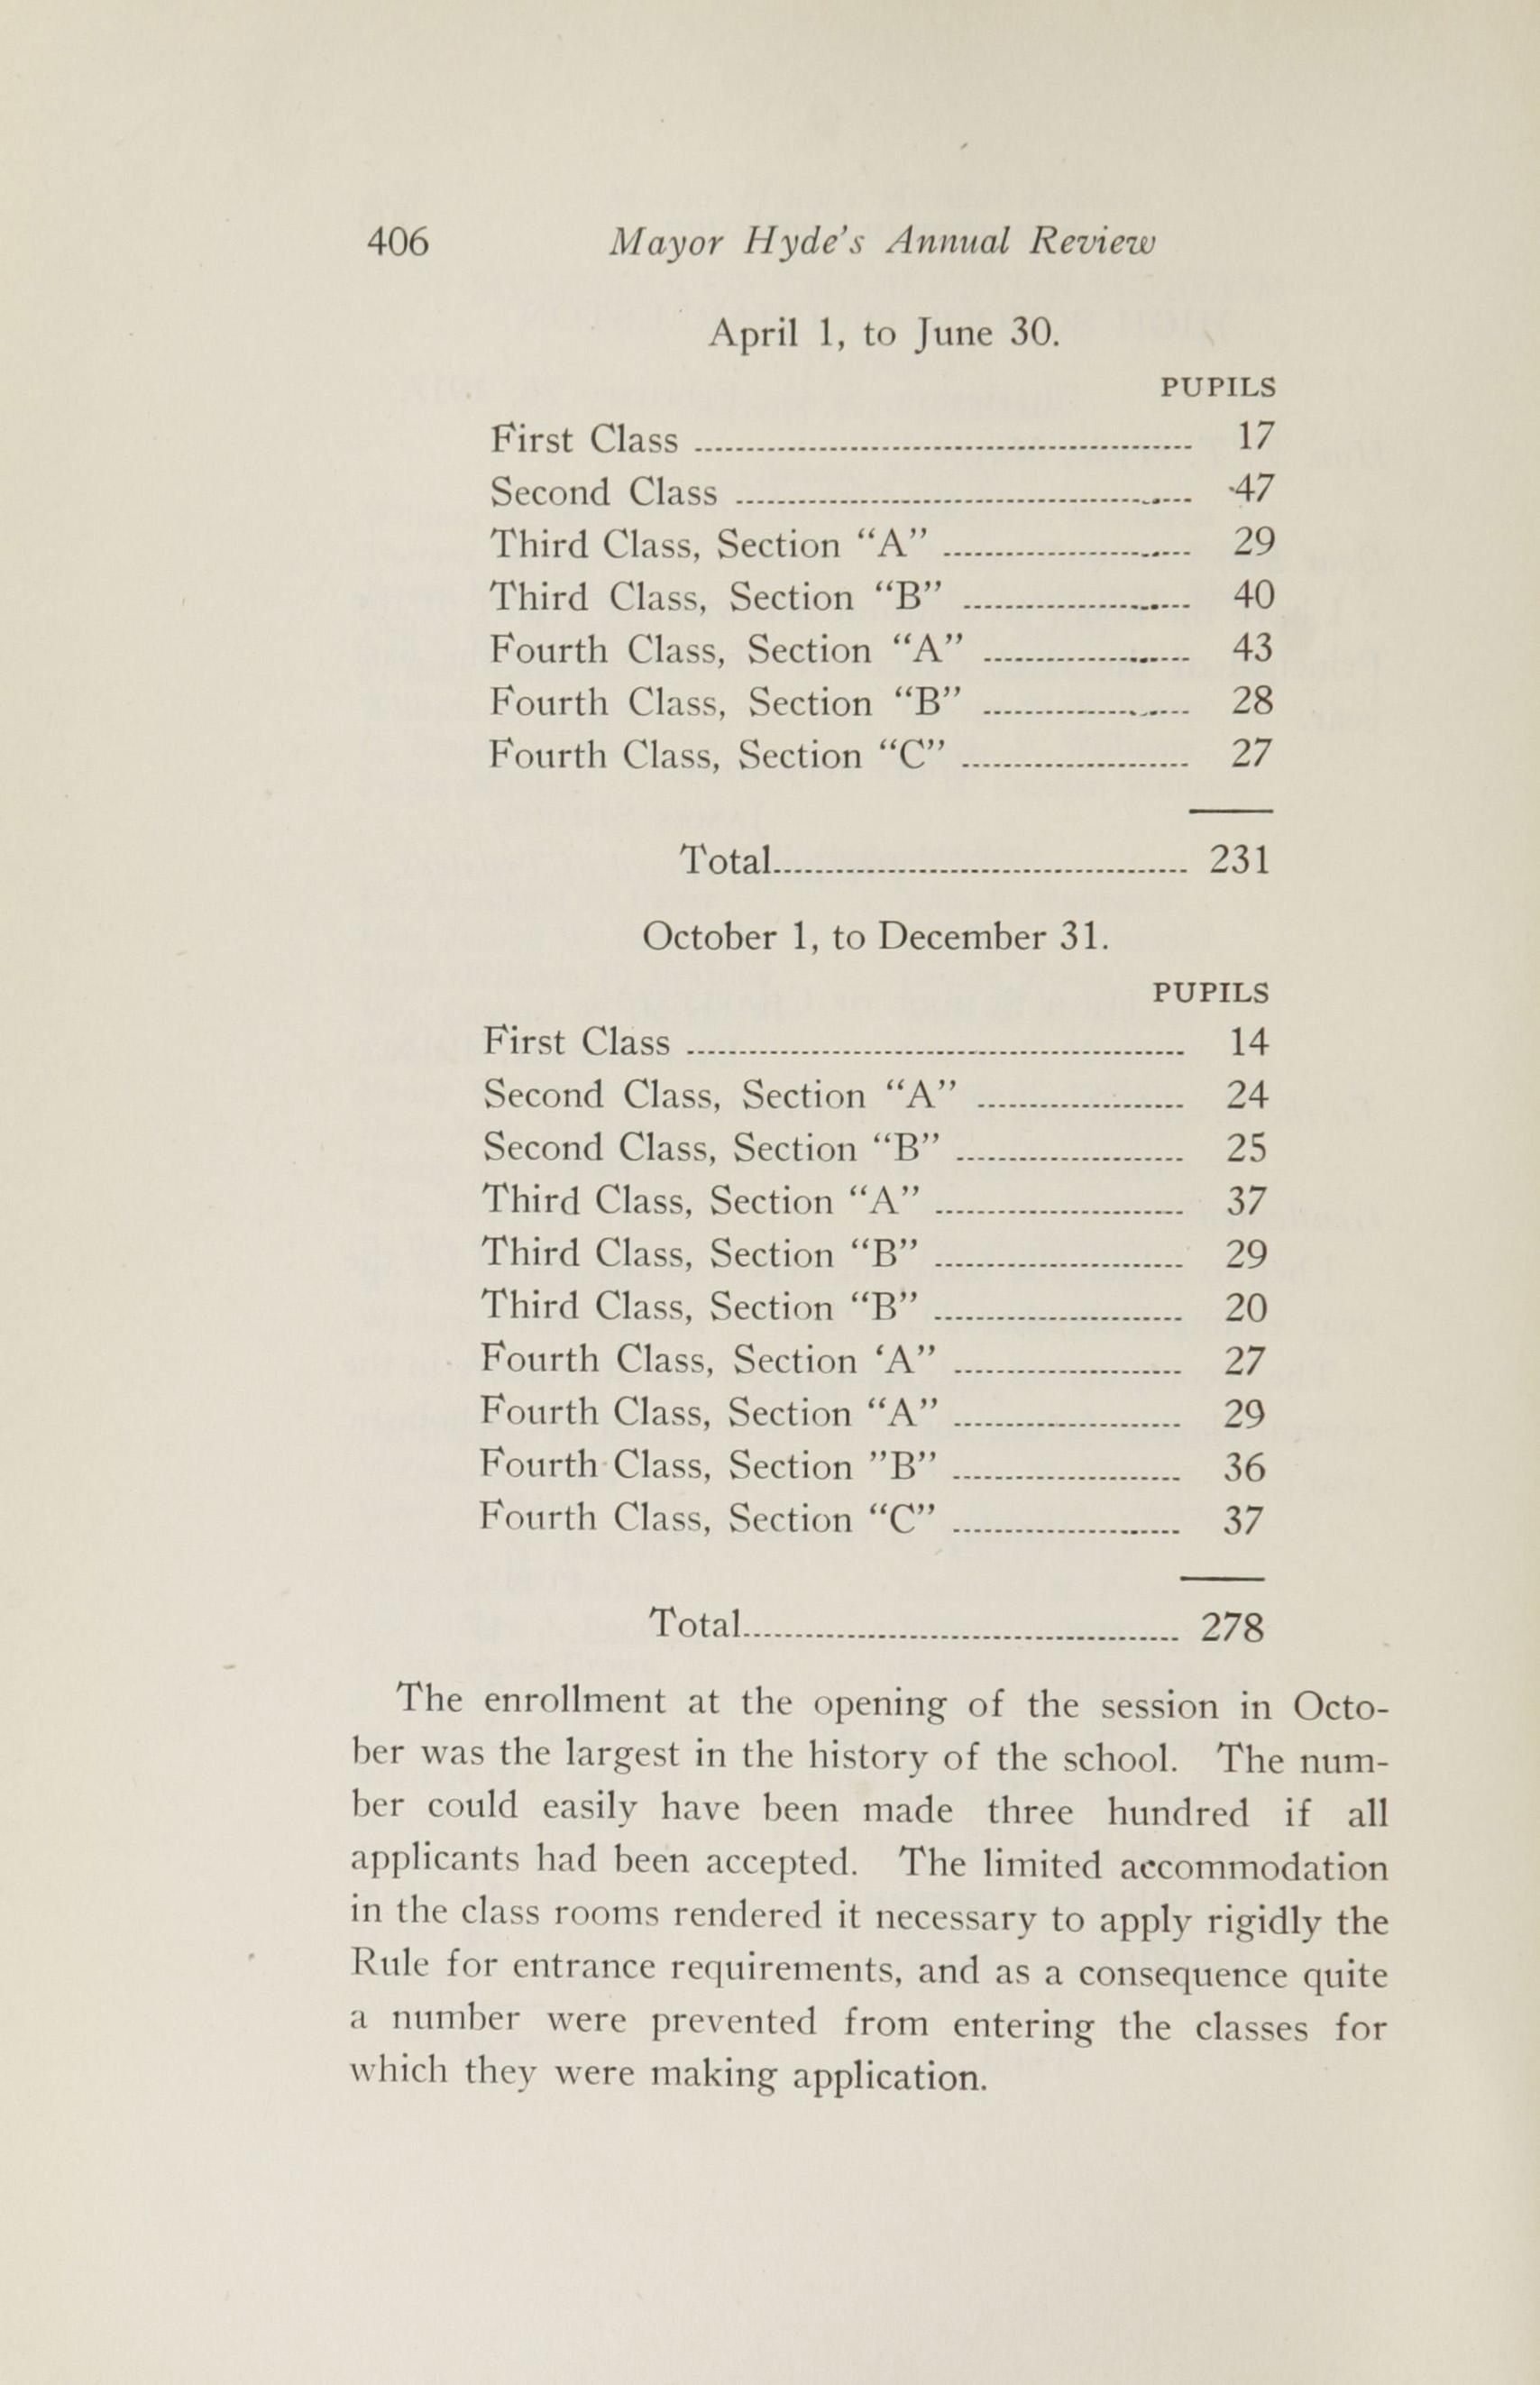 Charleston Yearbook, 1916, page 406